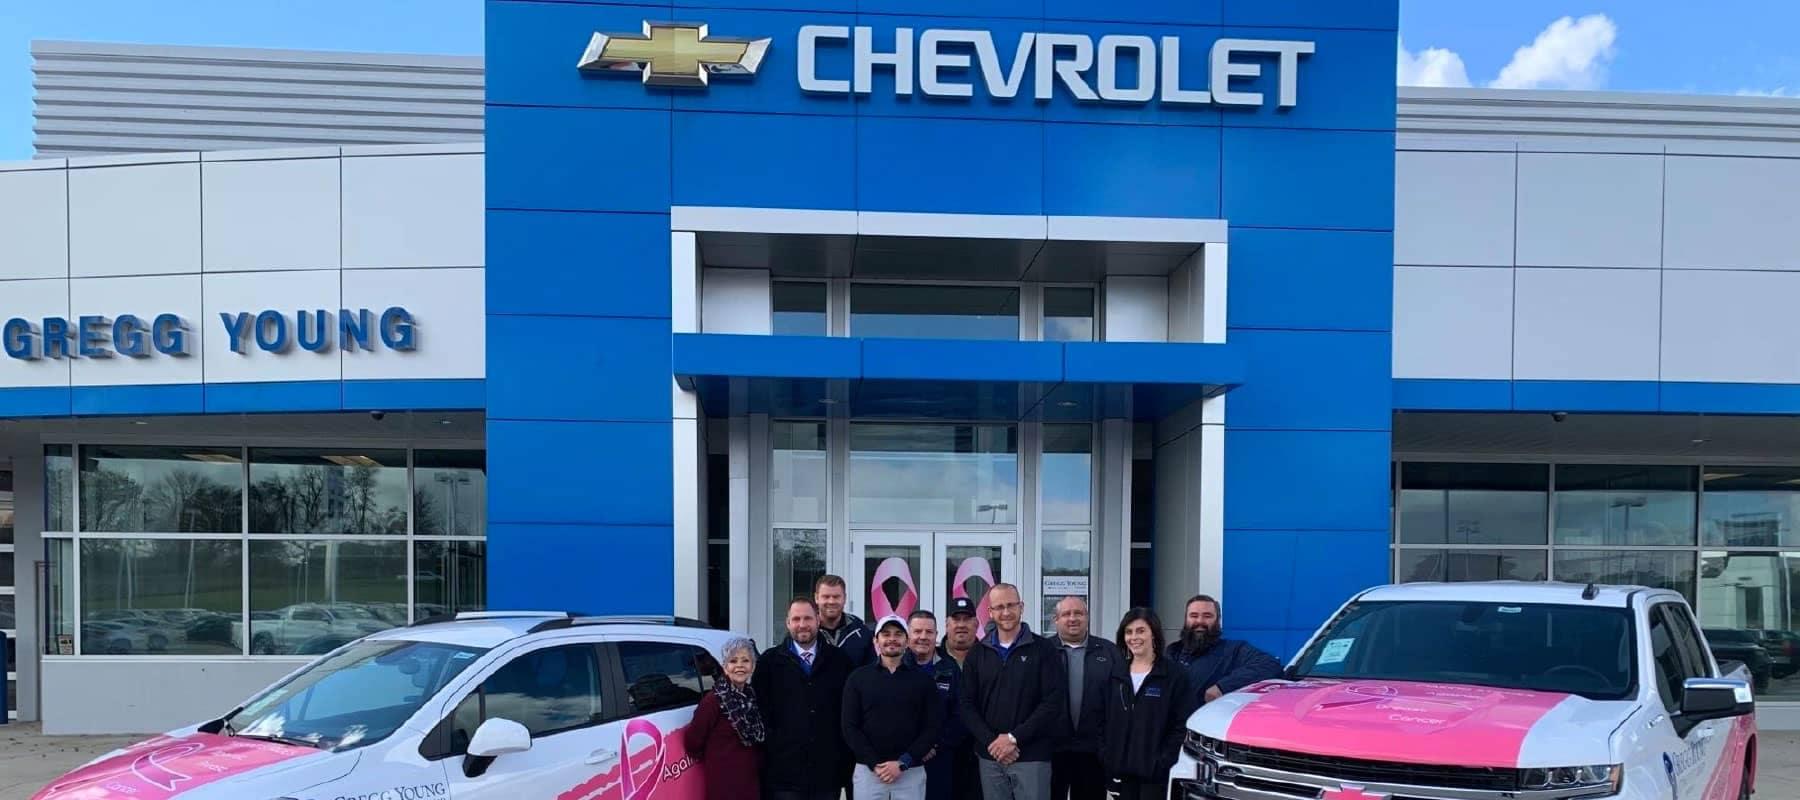 Gregg Young Chevrolet Dealership